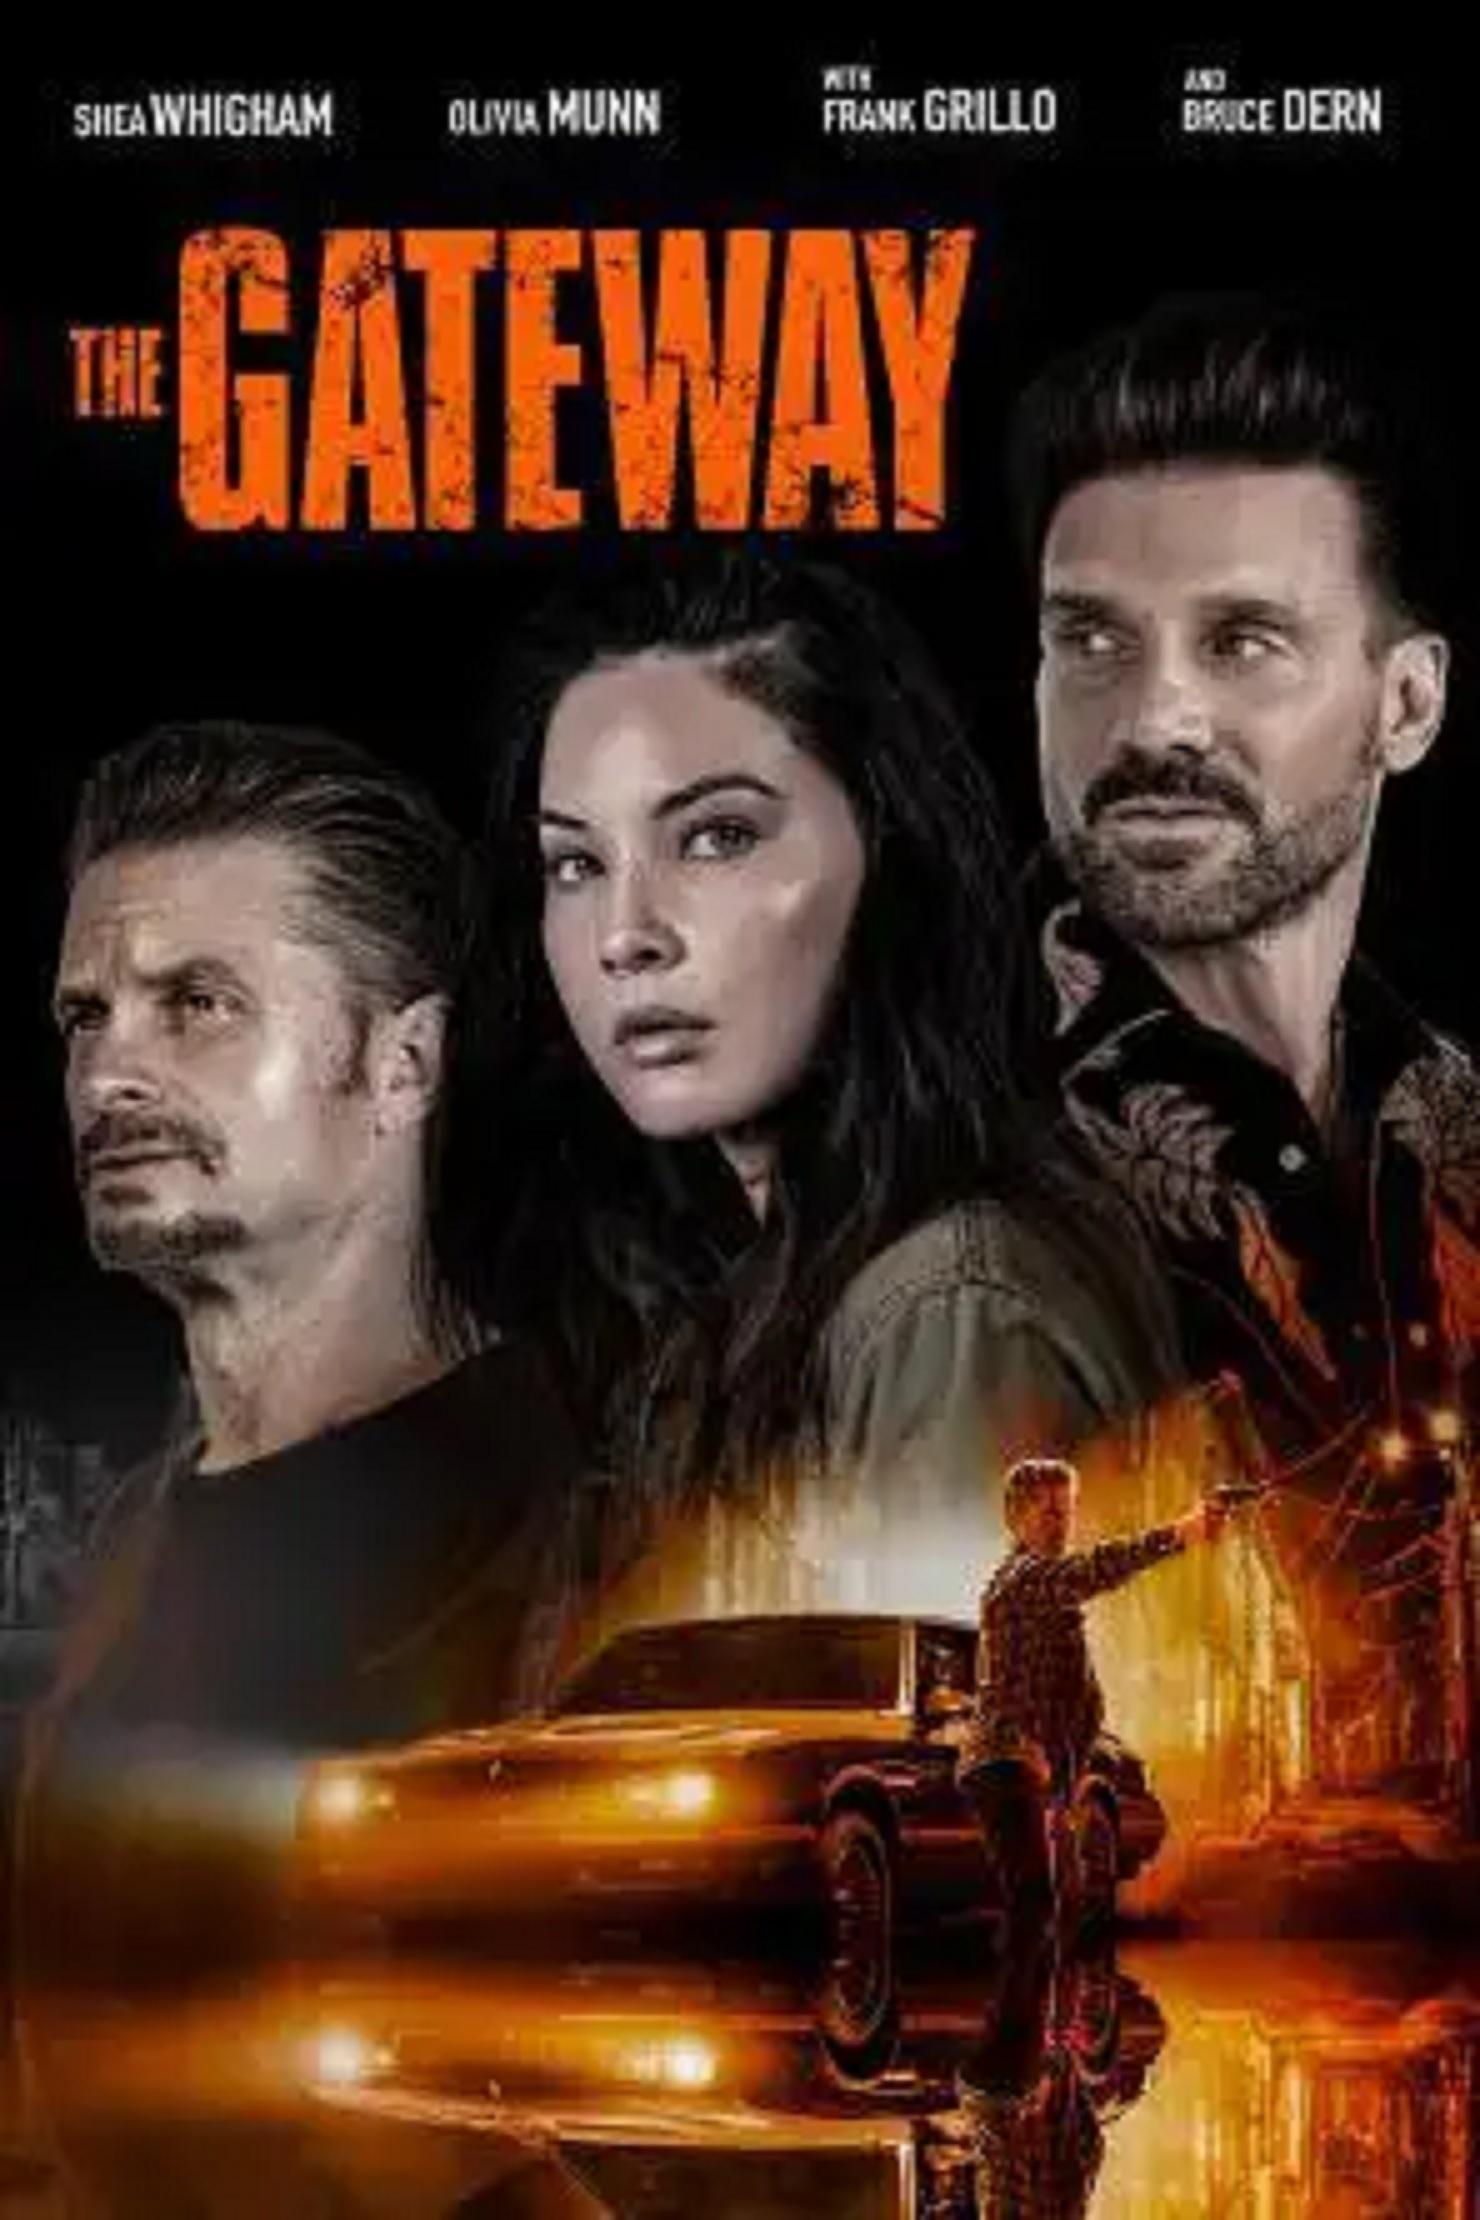 Download Filme The Gateway Qualidade Hd